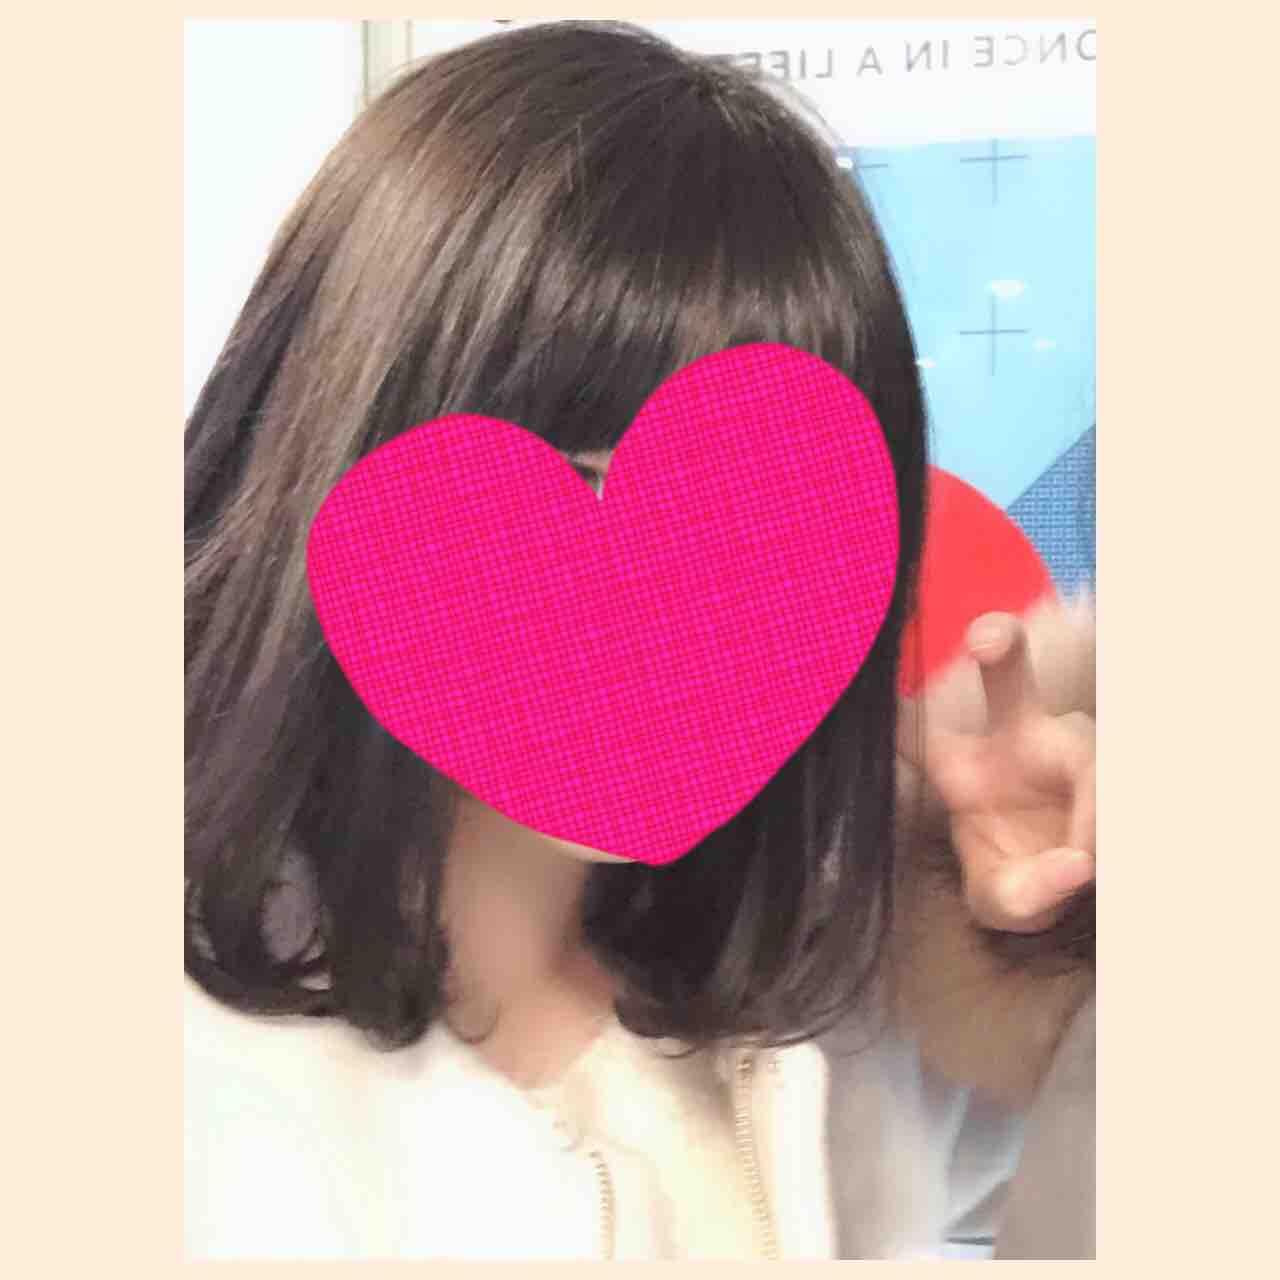 fc2blog_20190418191626b0c.jpg